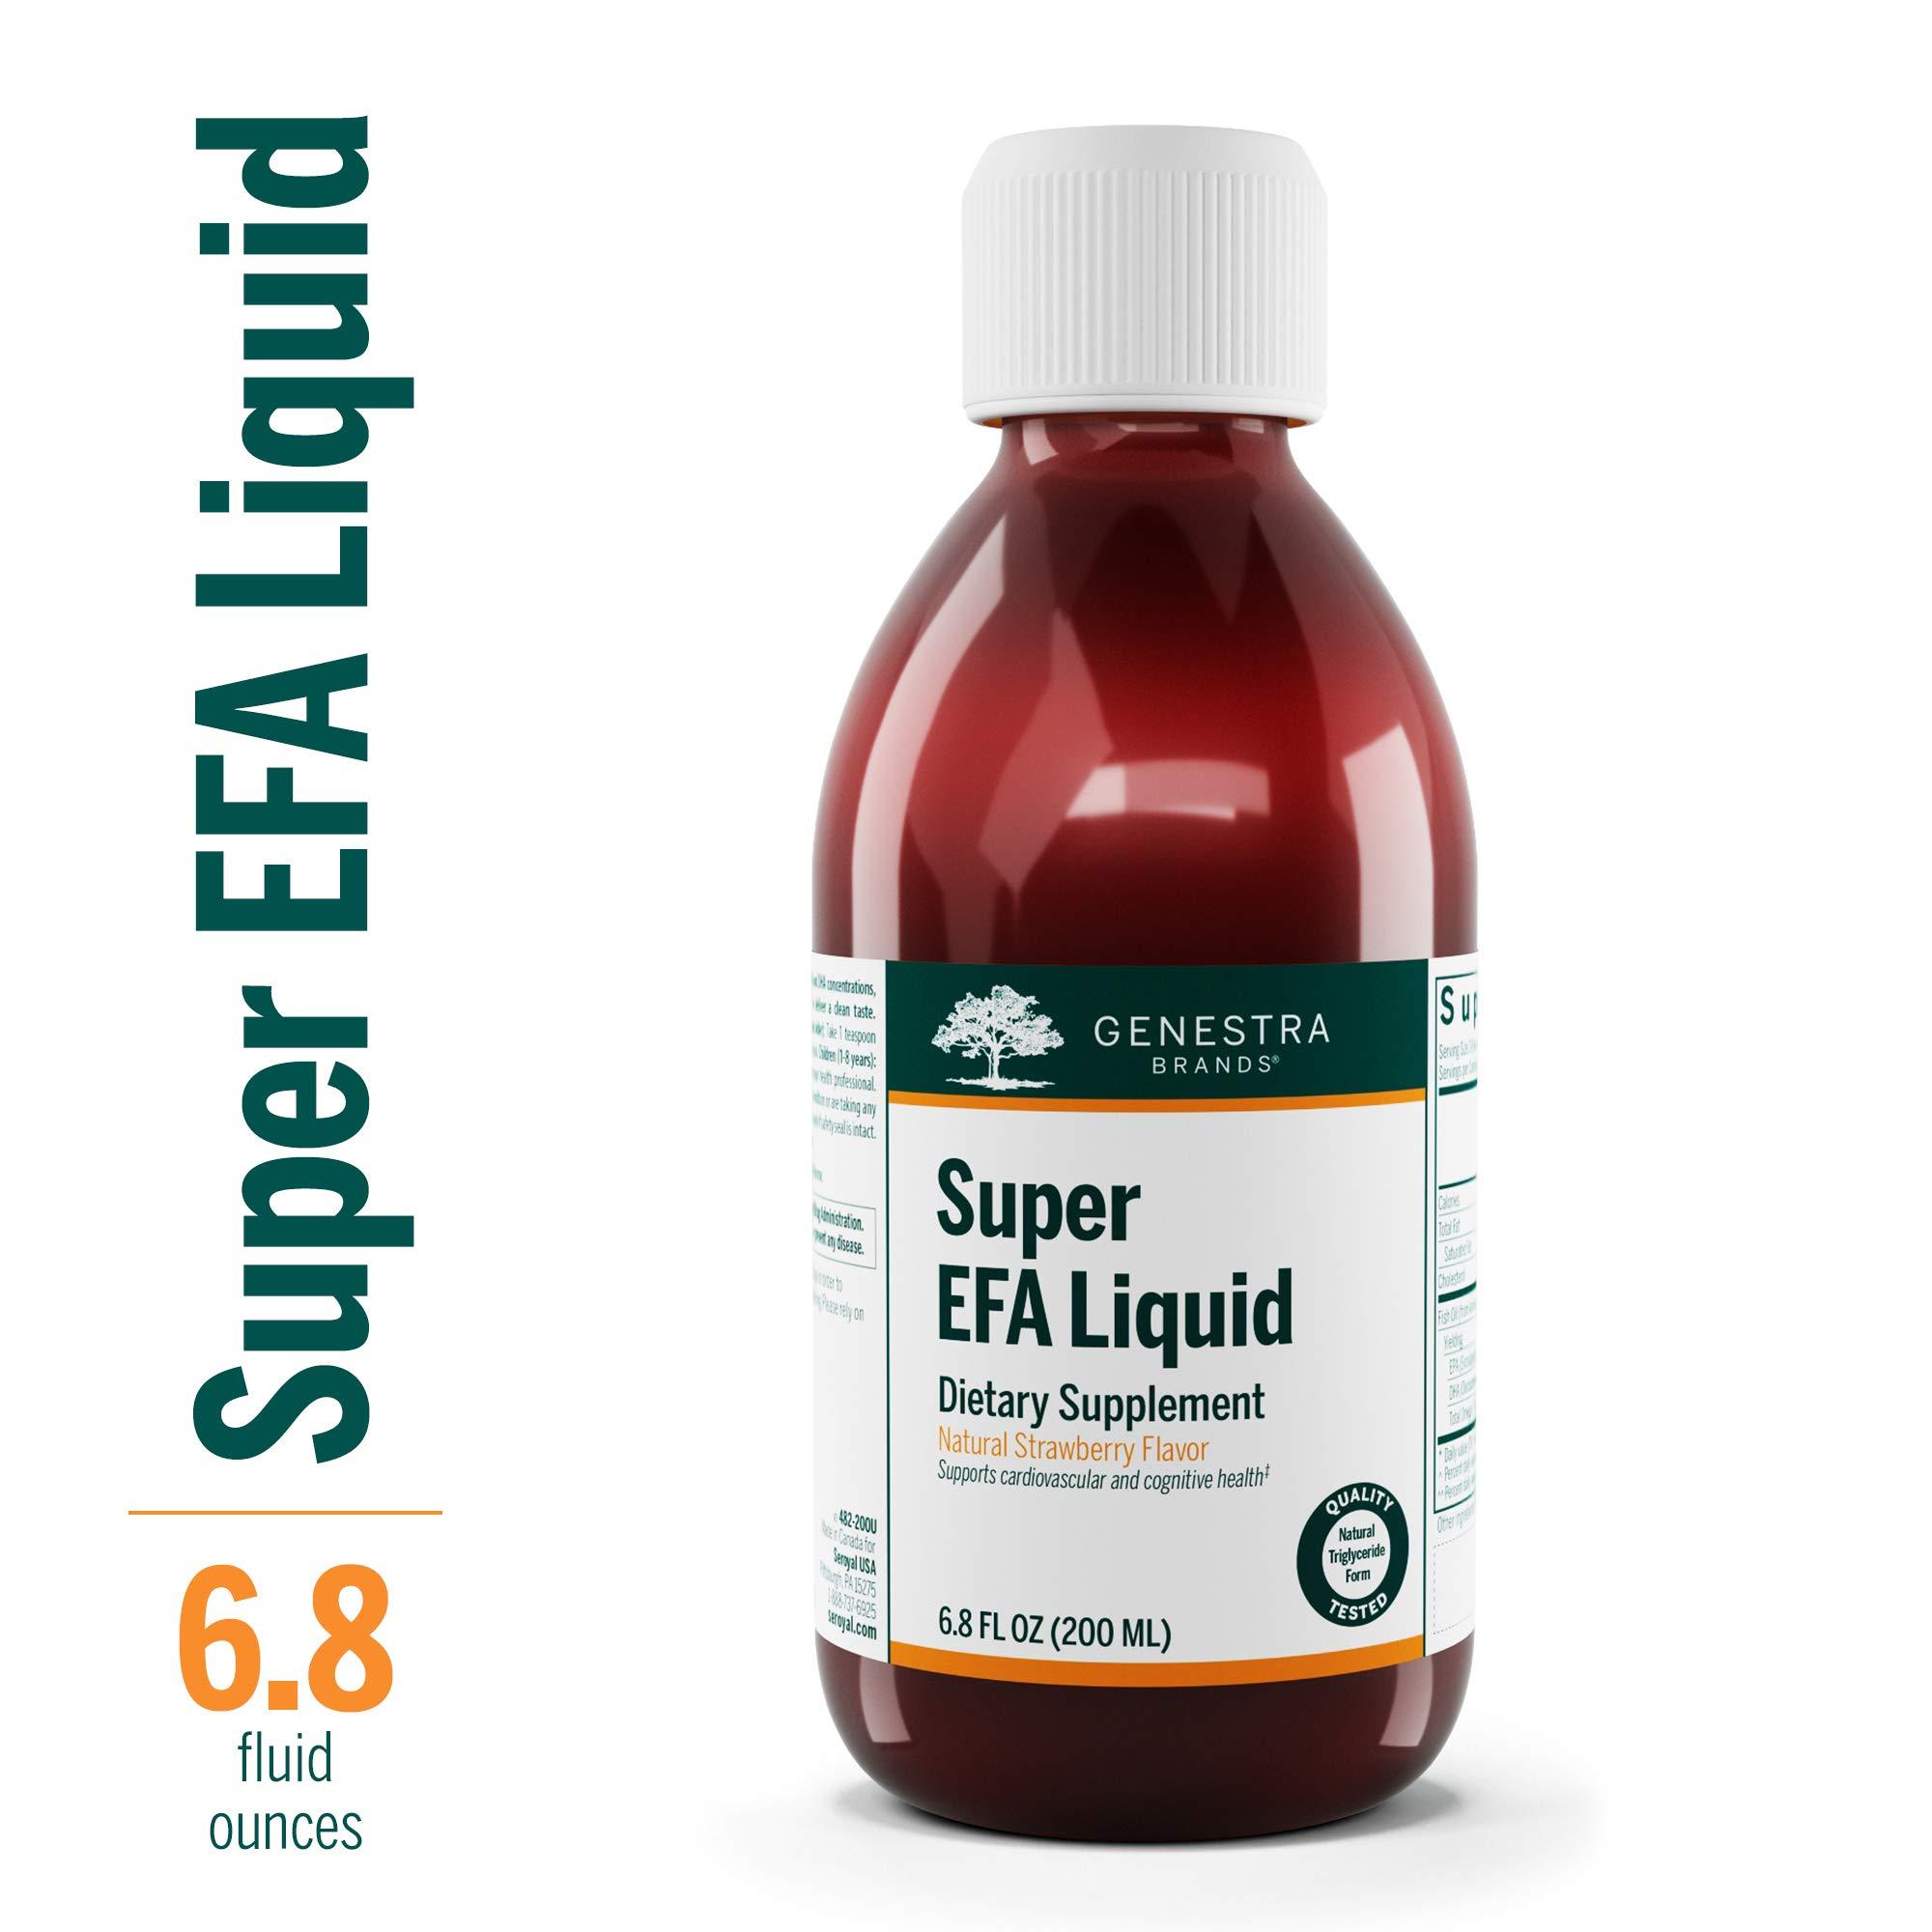 Genestra Brands - Super EFA Liquid - EFA Supplement to Support Cardiovascular, Brain, Eyes, and Nerves* - Natural Strawberry Flavor - 6.8 fl oz (200 ml) by Genestra Brands